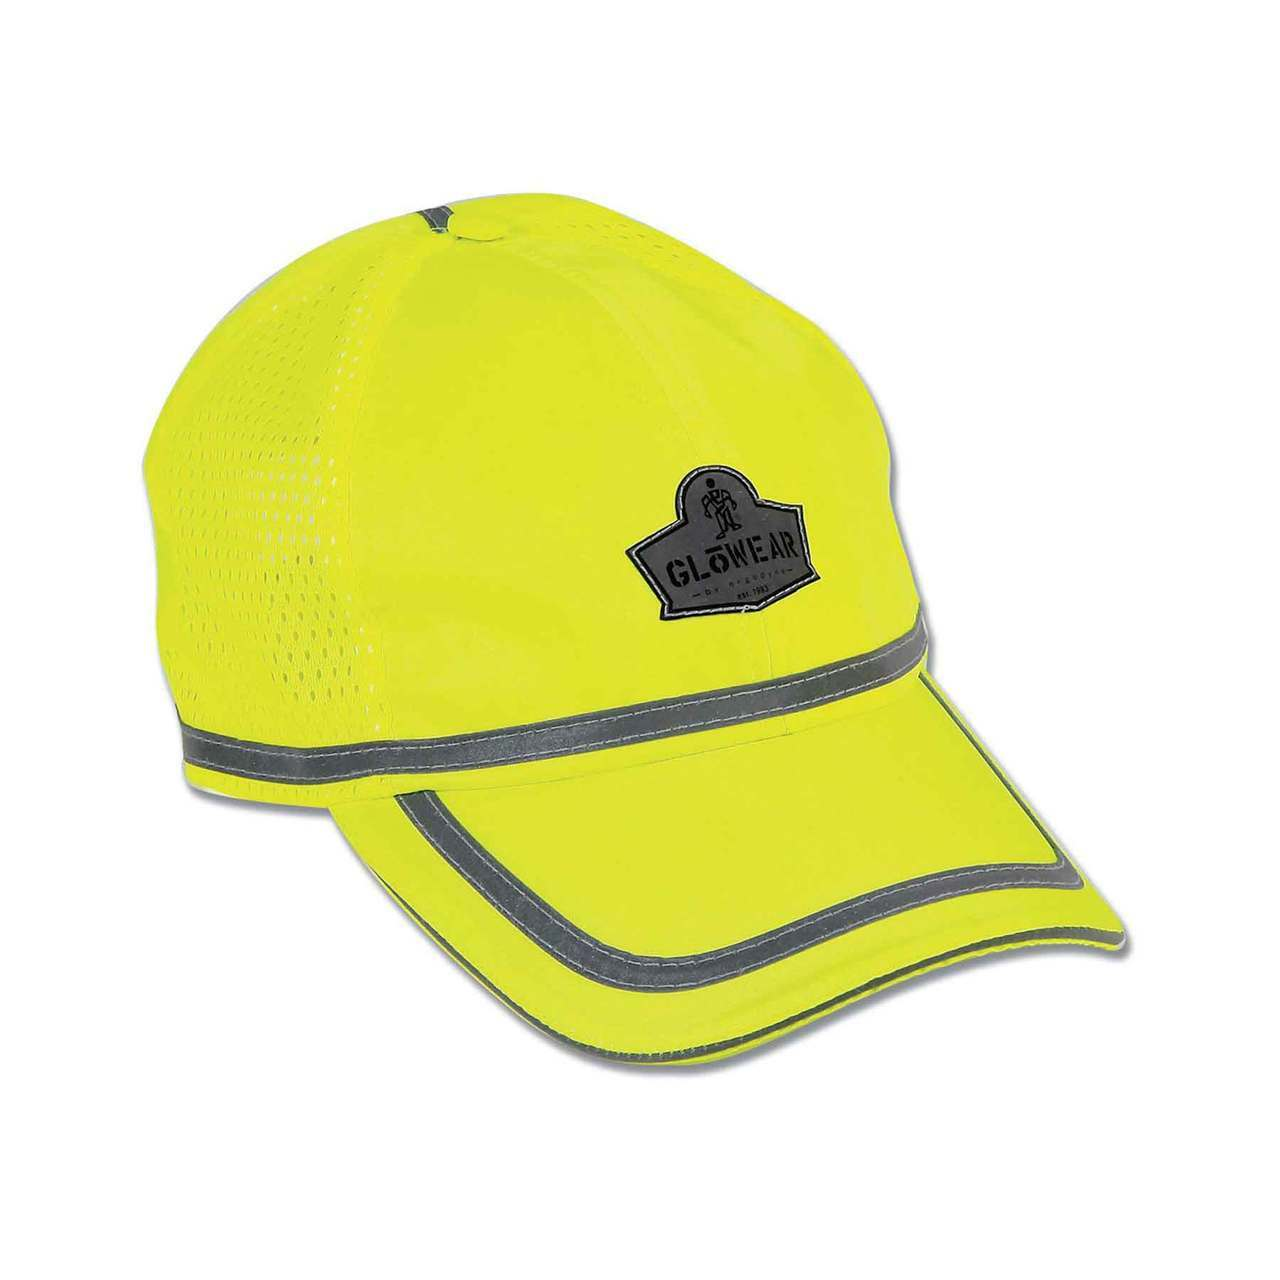 ead2a7db323 Ergodyne GloWear 8930 Lime Hi-Vis Baseball Cap - Jendco Safety Supply